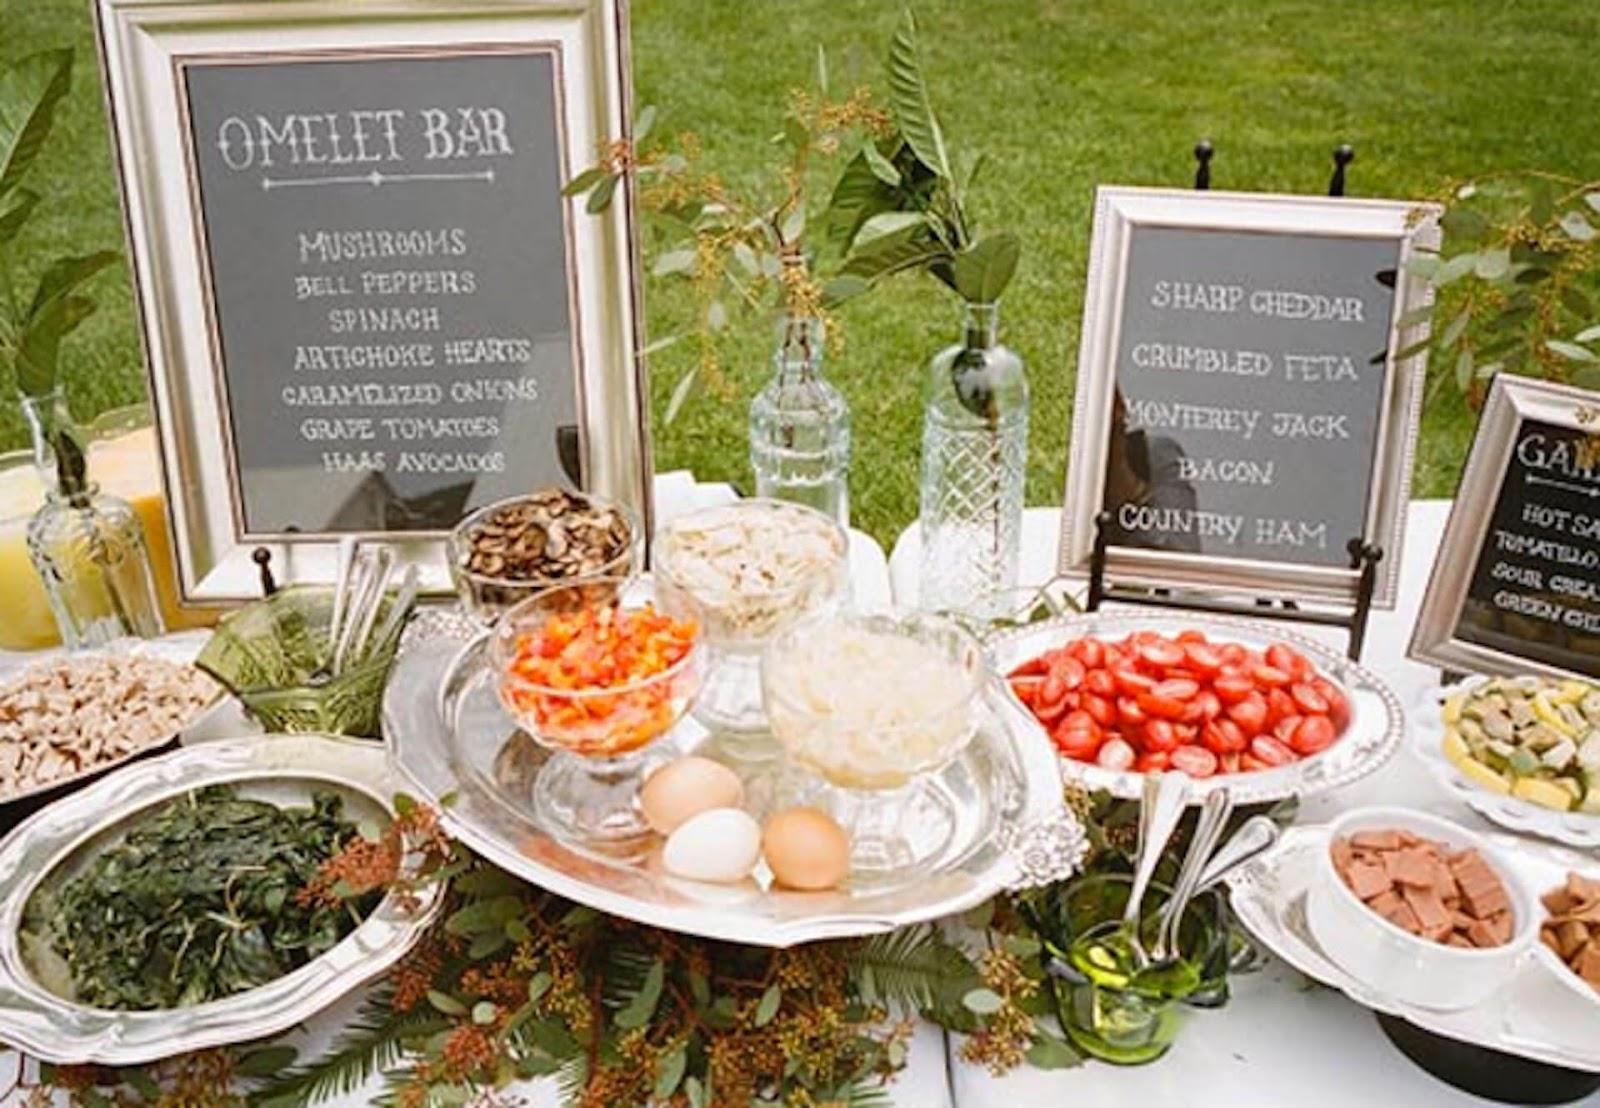 Omelet Bar at a wedding